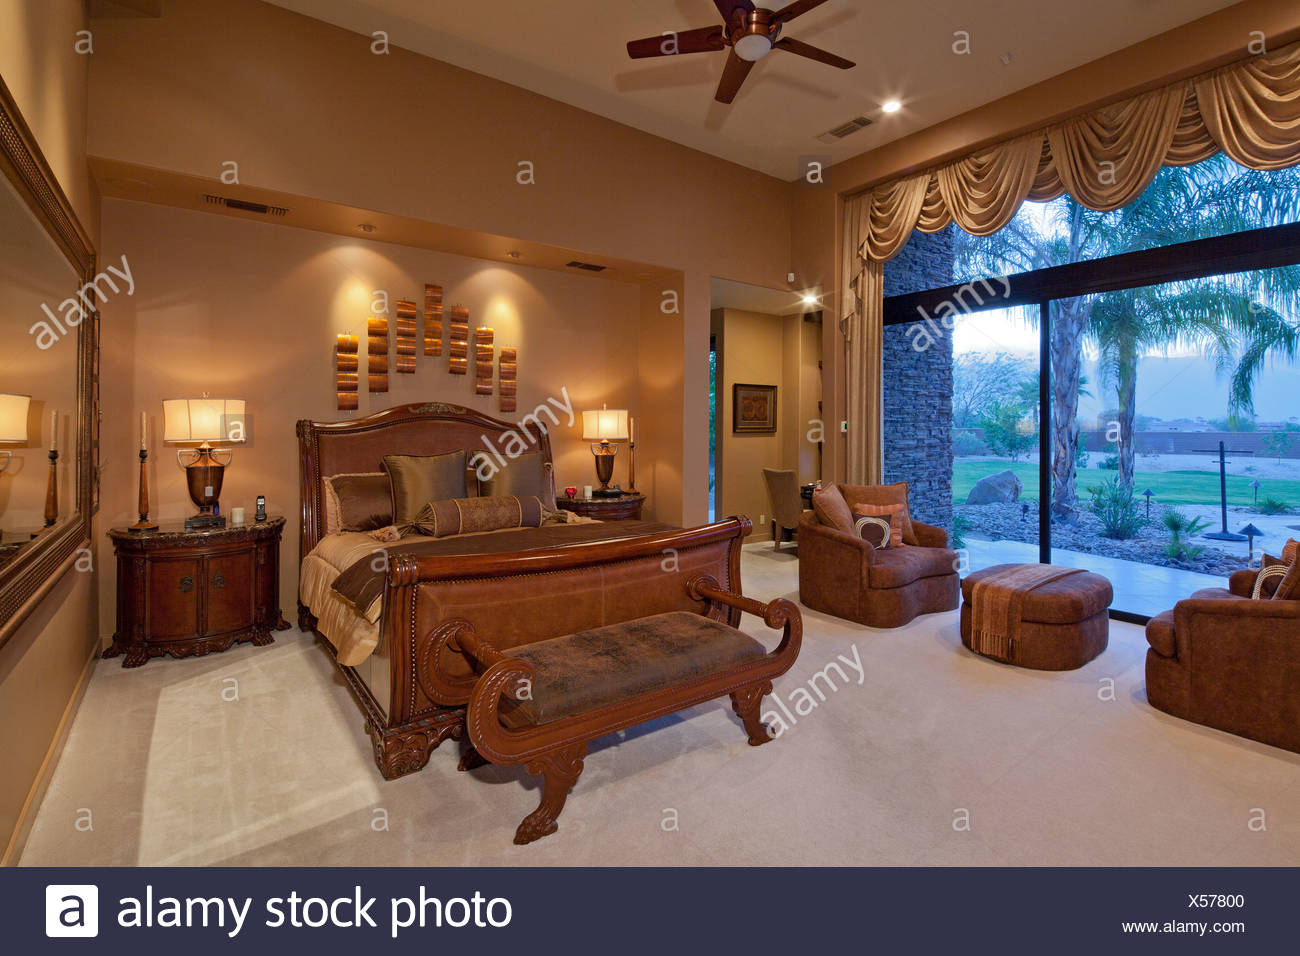 Elegant luxurious bedroom - Stock Image